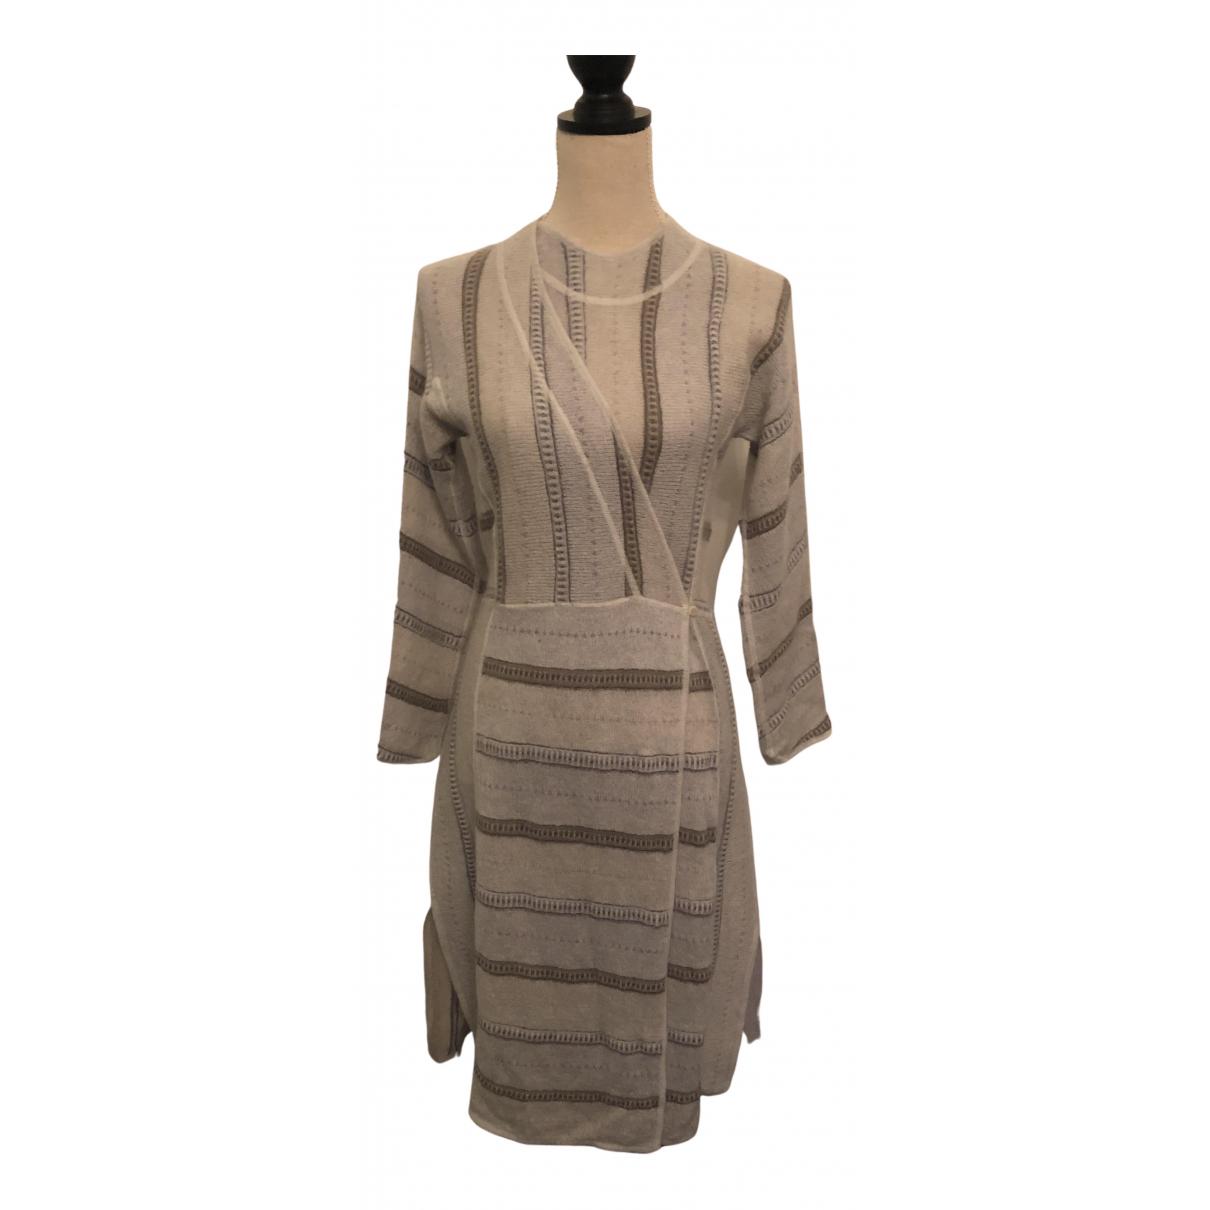 Giorgio Armani N Multicolour Wool dress for Women 44 IT